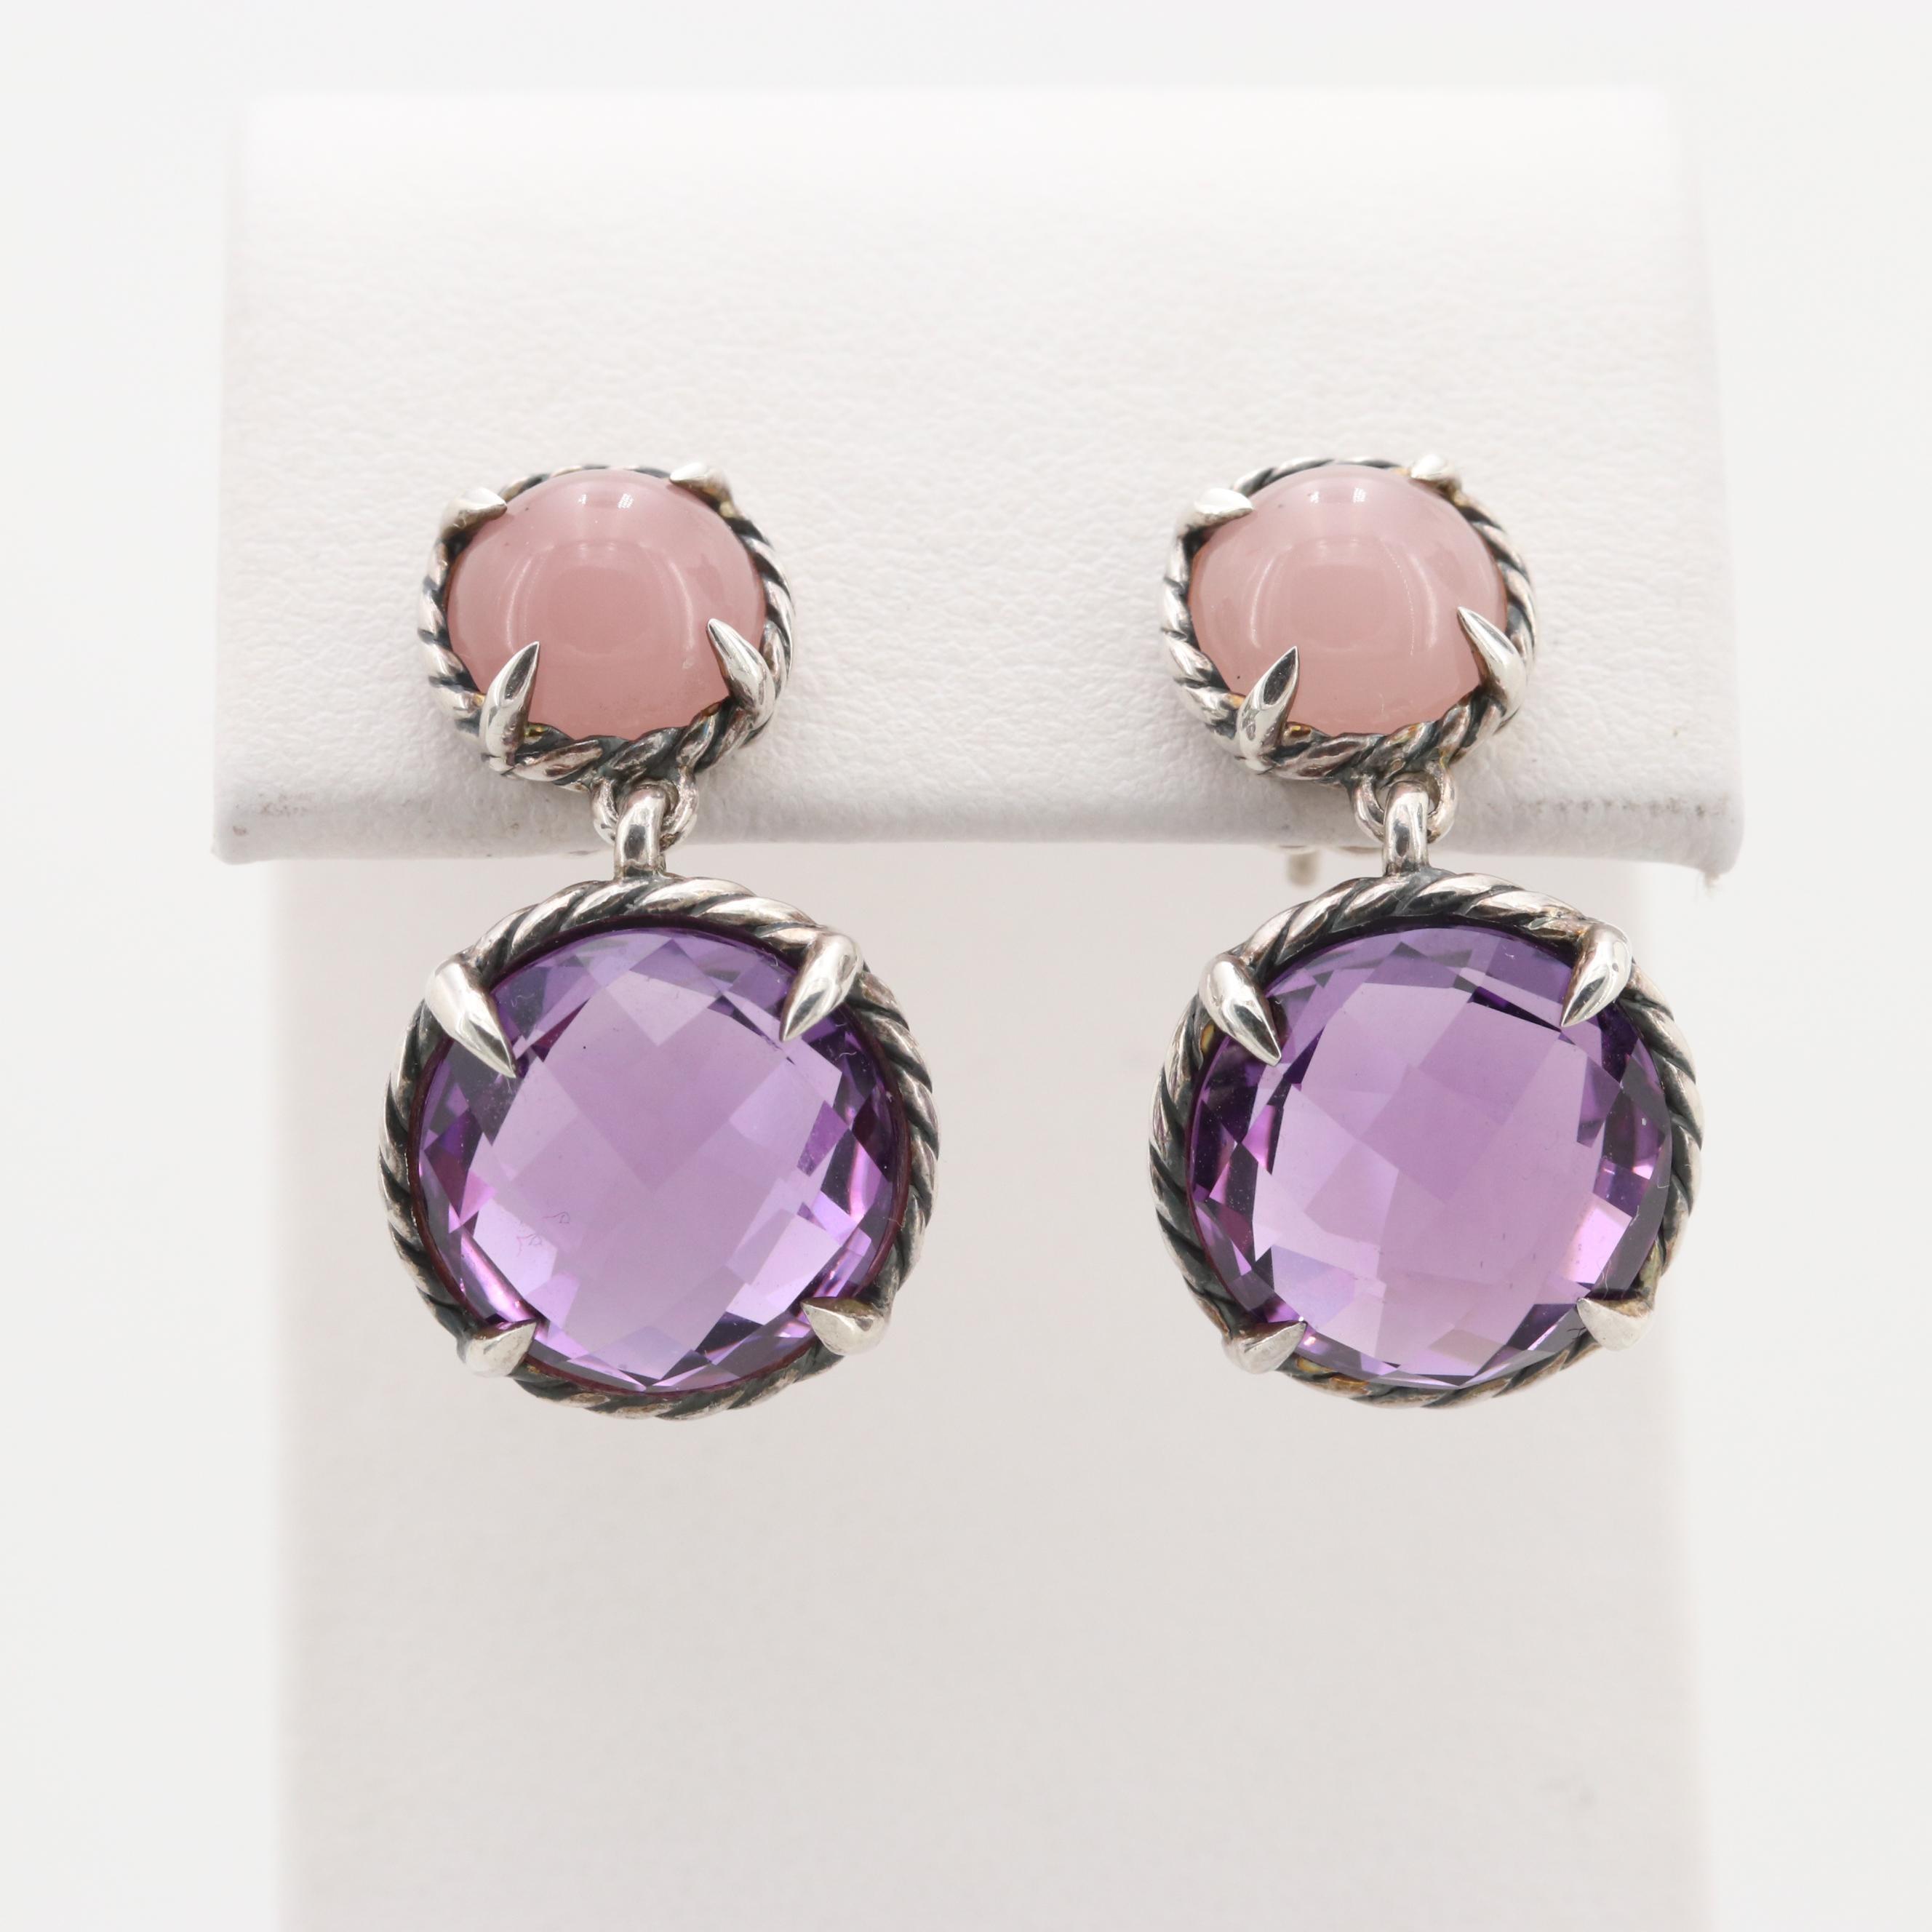 David Yurman Sterling Silver Amethyst and Rose Quartz Dangle Earrings